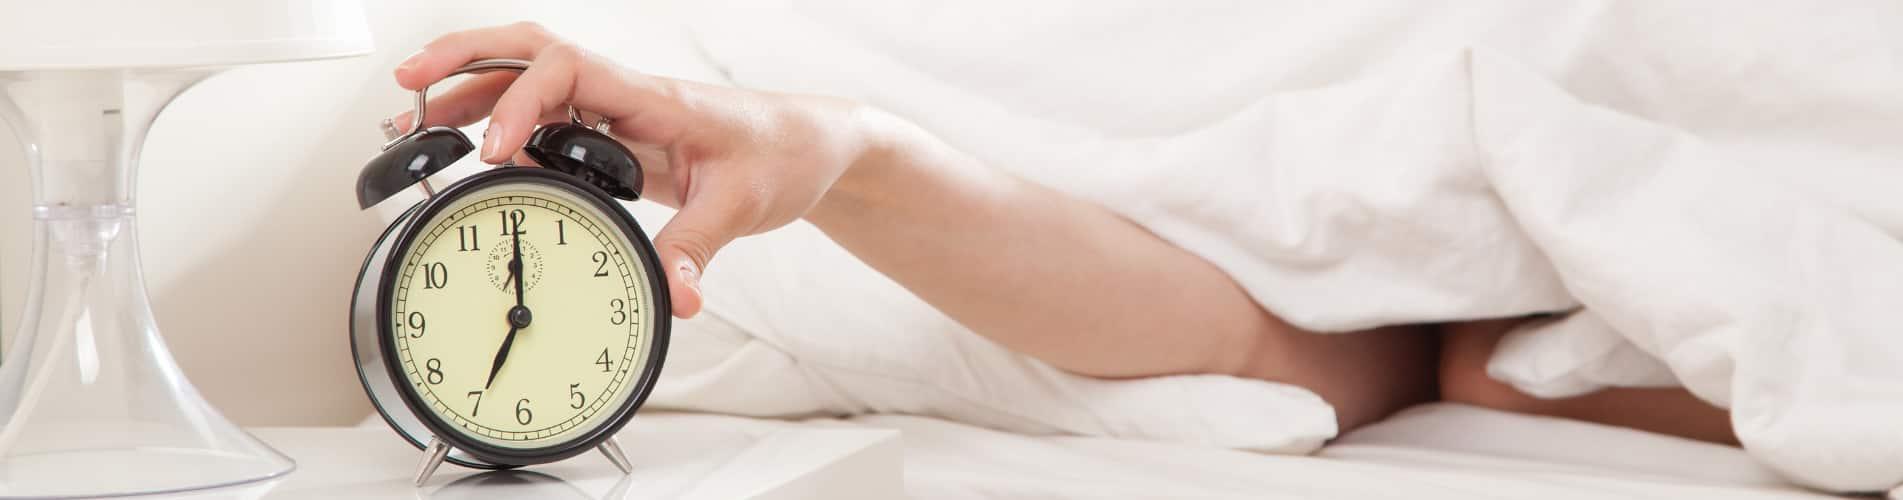 The Importance Of a Good Sleep